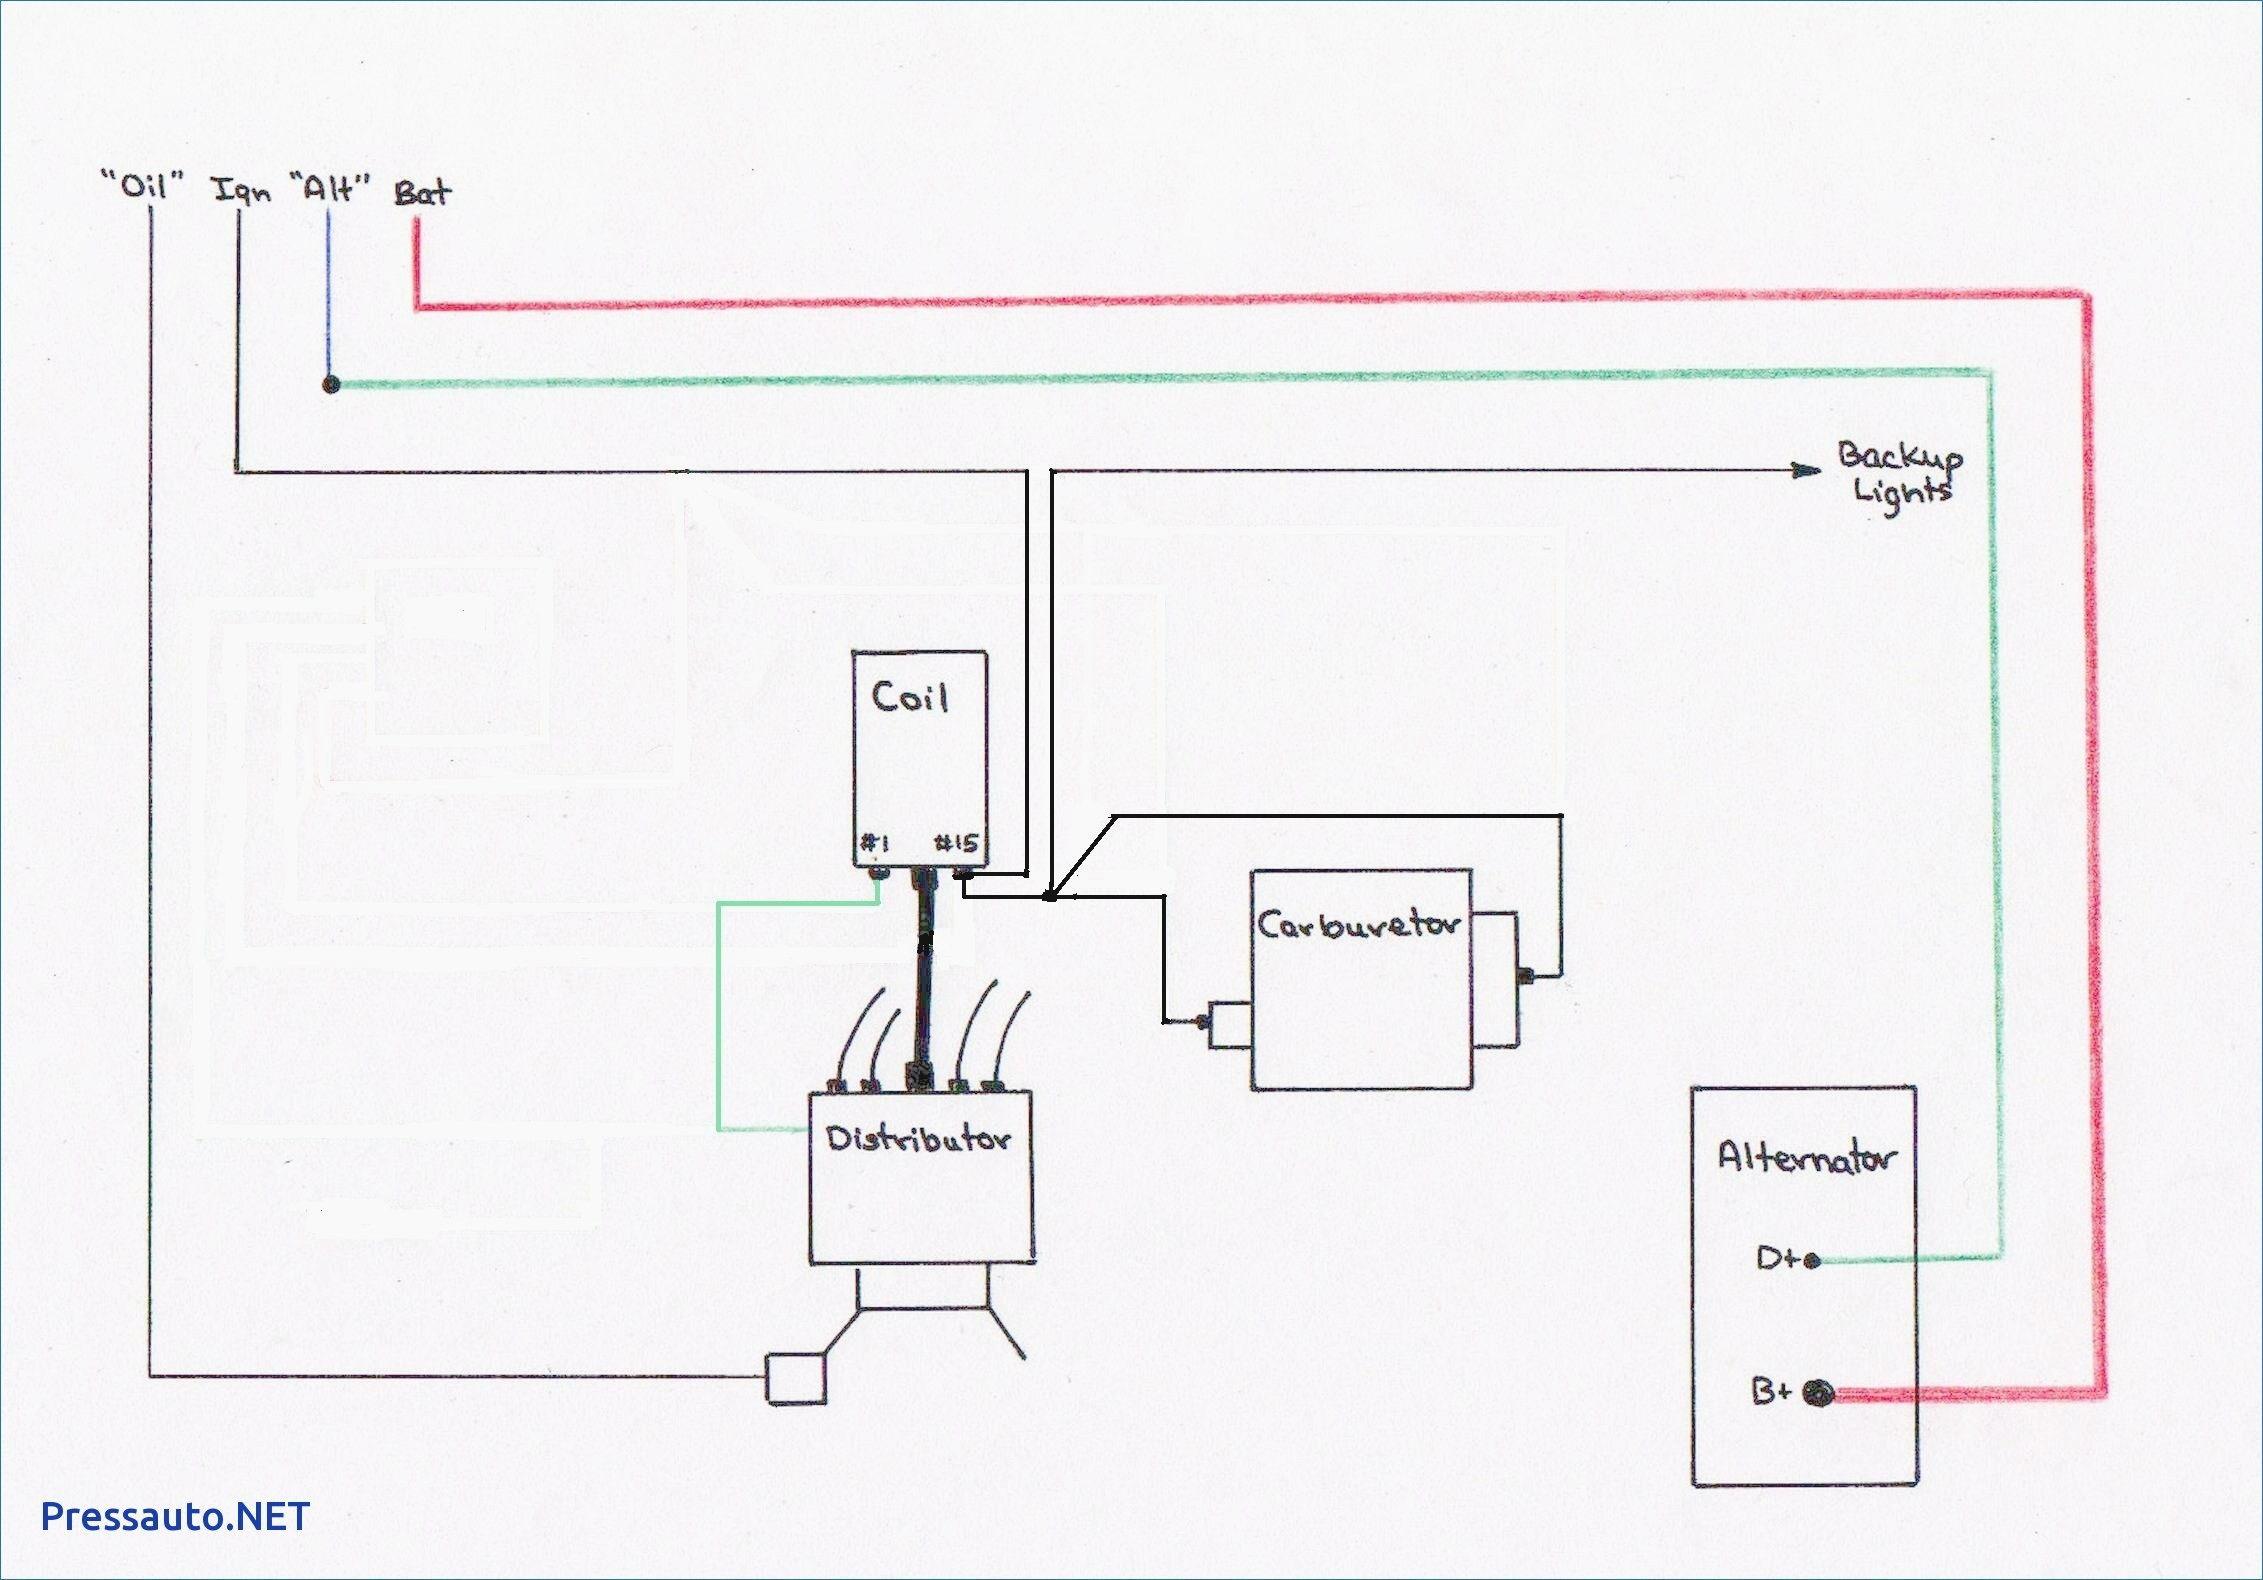 [FPWZ_2684]  HB_0532] Farmtrac Tractor Alternator Wiring Diagram Schematic Wiring   Farmtrac Tractor Alternator Wiring Diagram      Phil Cran Trofu Pead Phae Mohammedshrine Librar Wiring 101